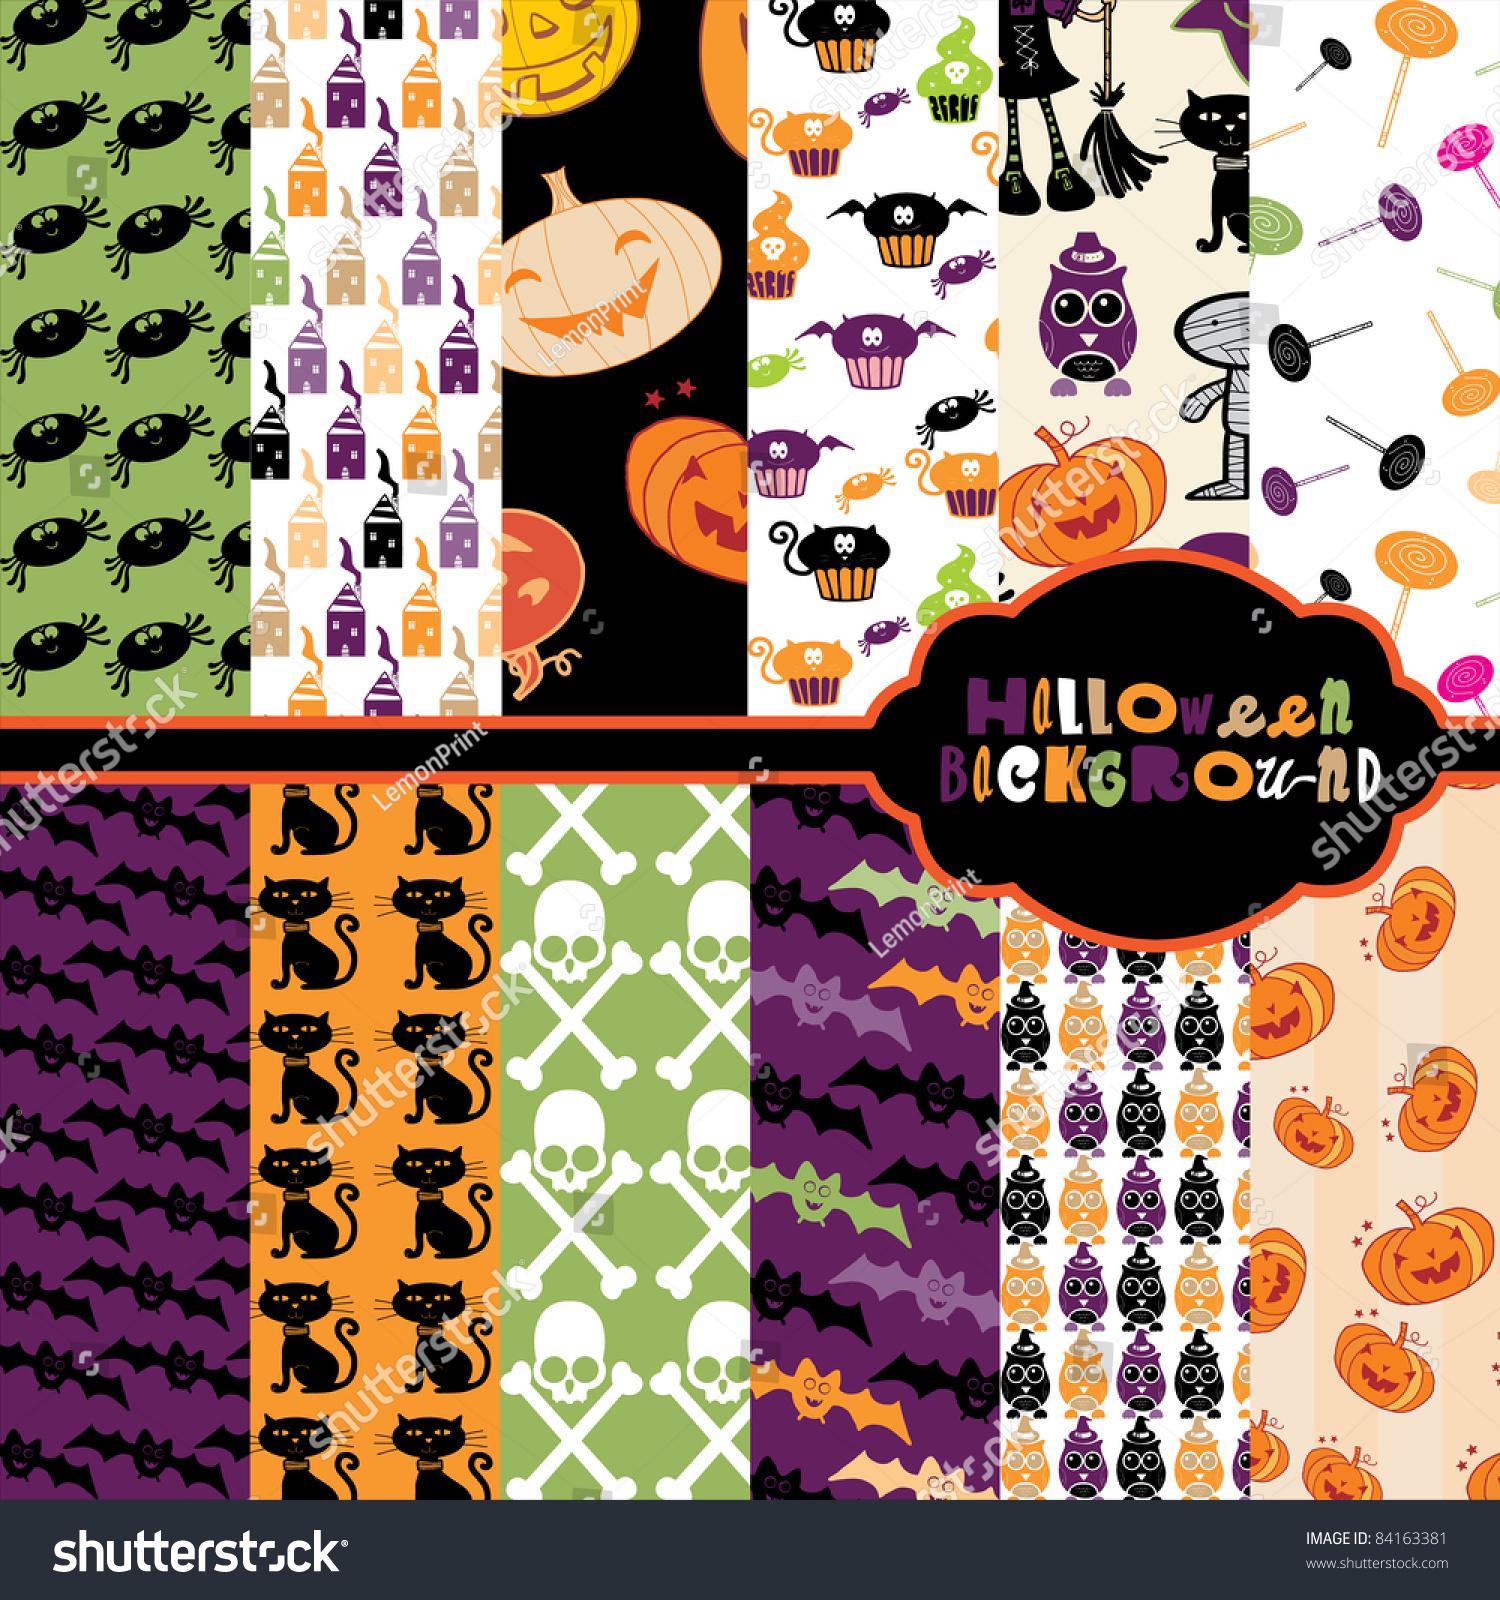 Cute Halloween Backgrounds Stock Vector 84163381 - Shutterstock